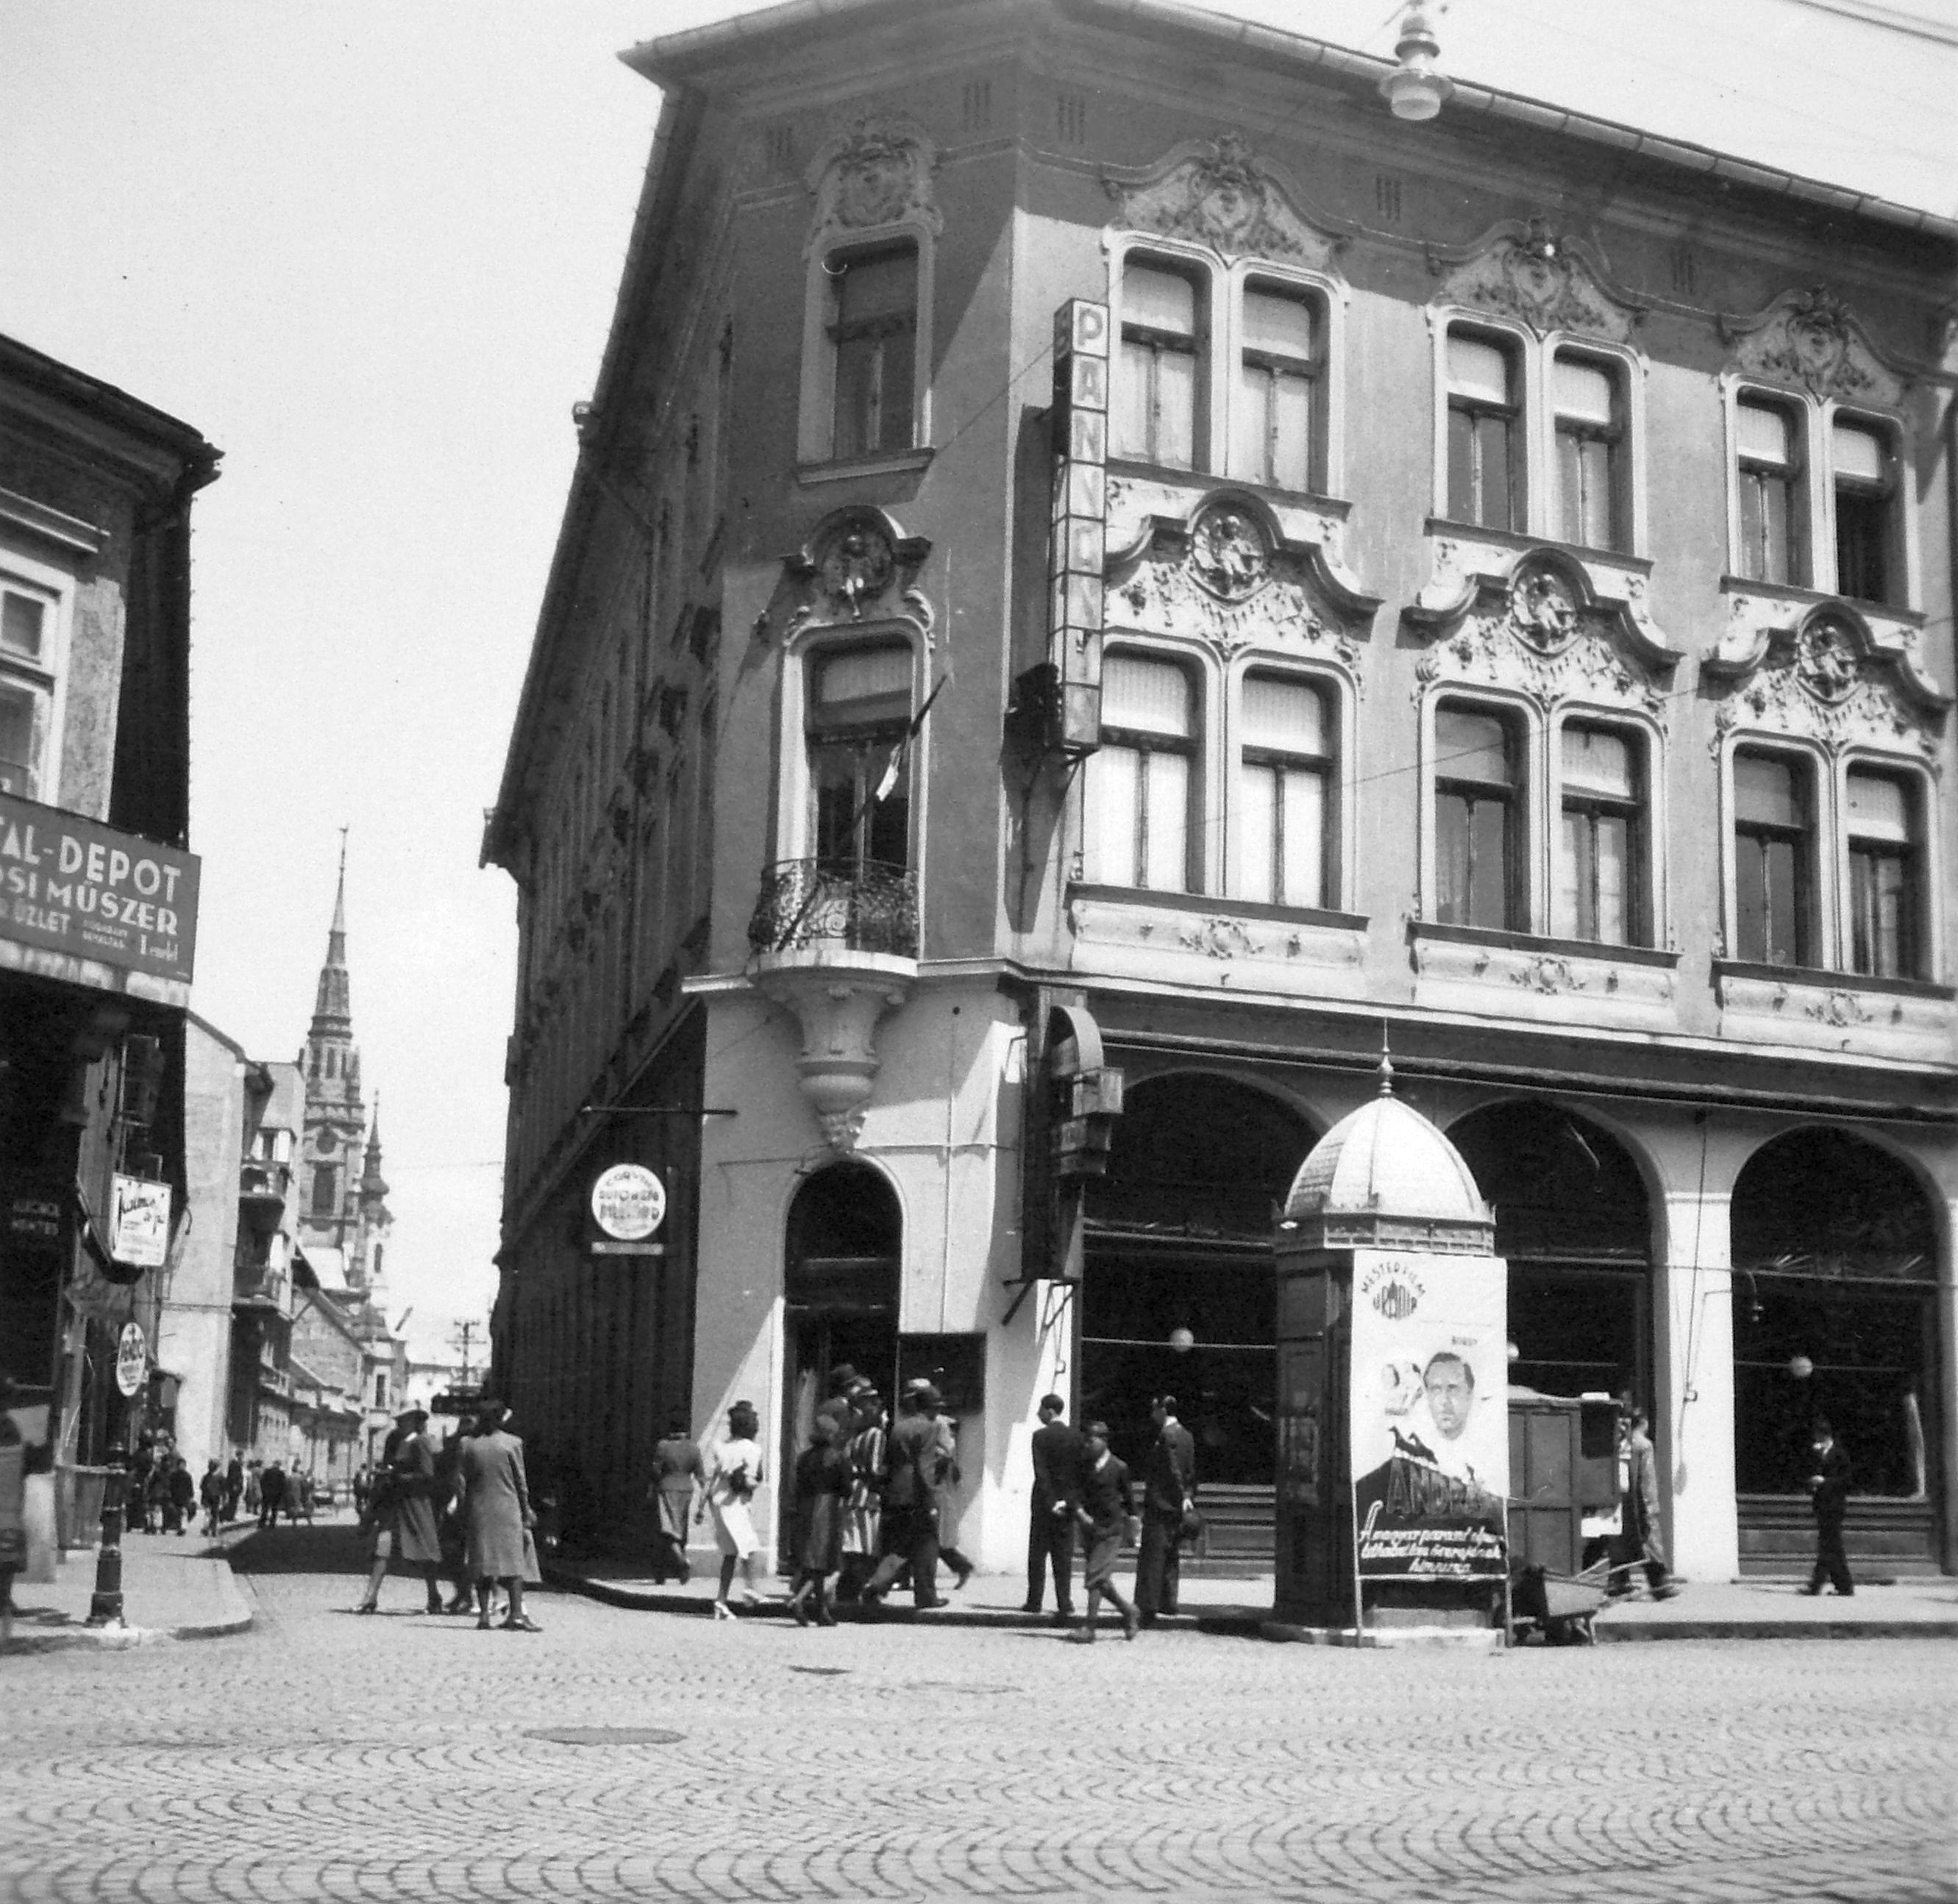 88244f5736 File:Széchenyi utca - Kossuth Lajos utca sarka, Pannónia szálló. Fortepan  7106.jpg